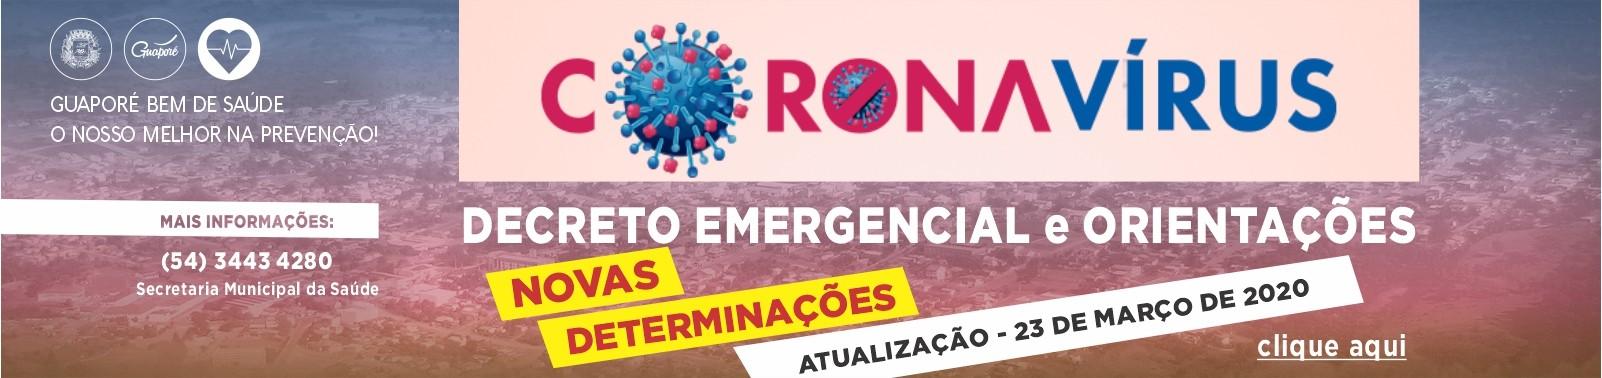 Banner 6 - Coronavírus - 3